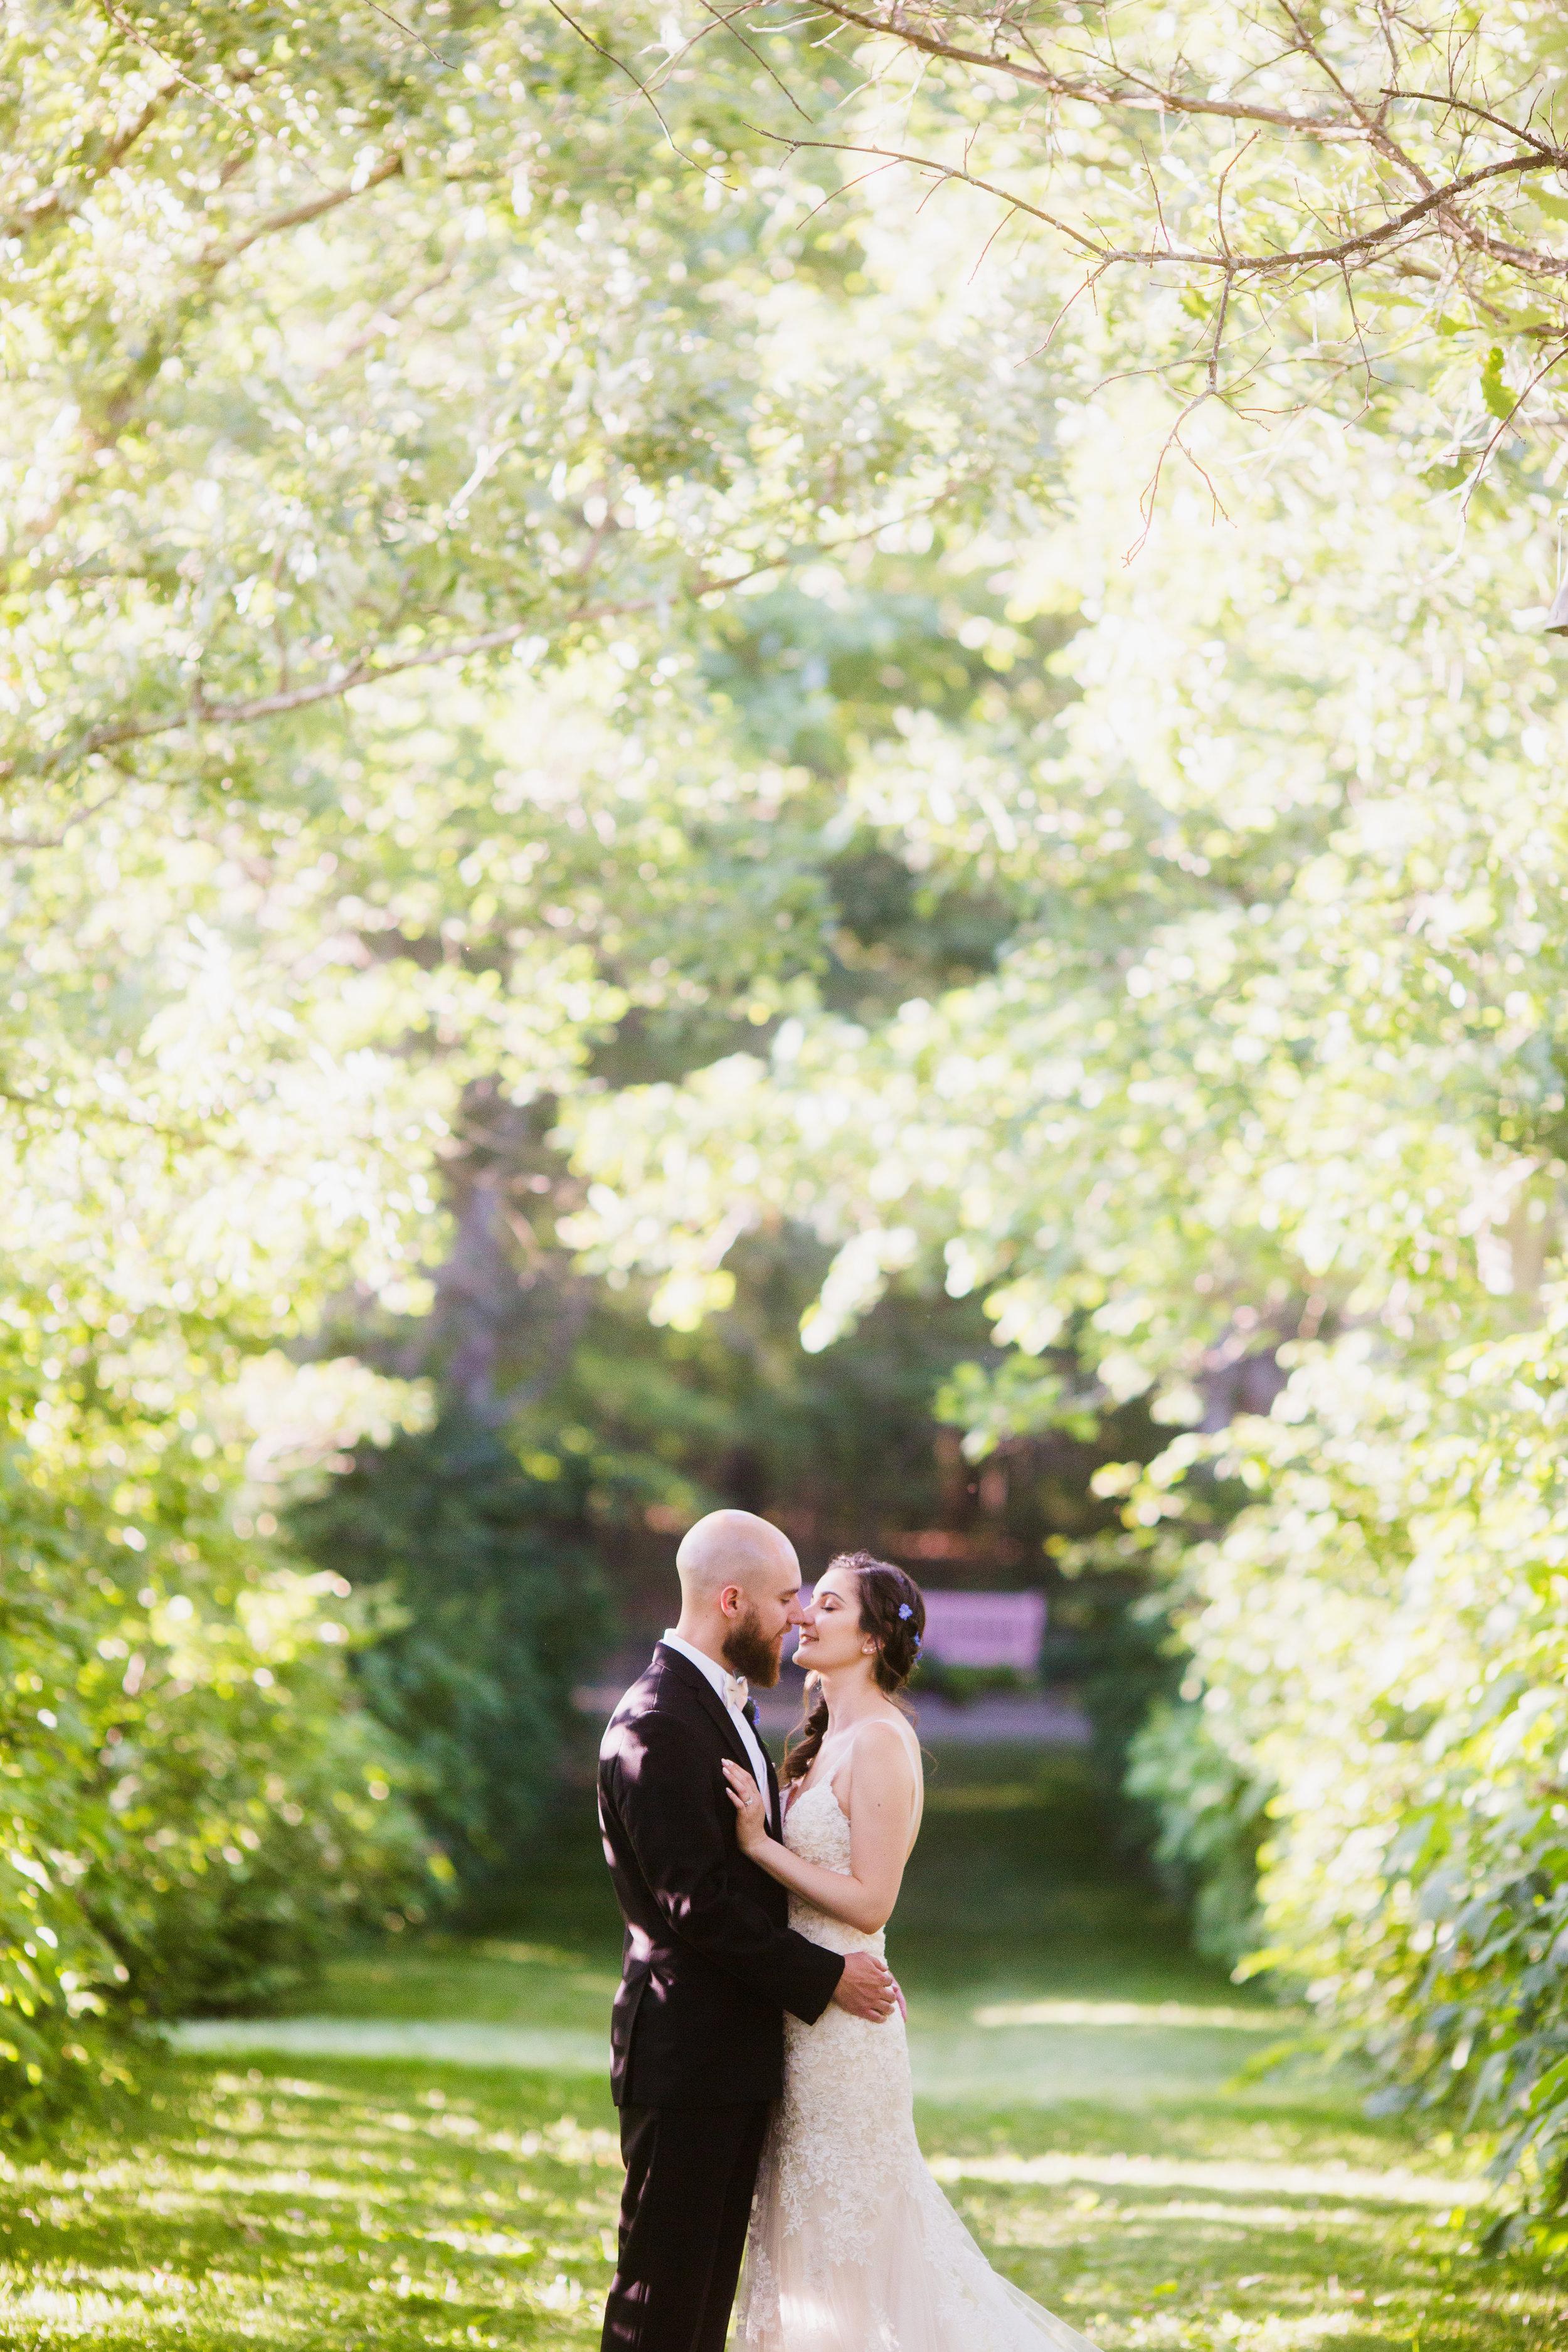 Tower-Hill-Botanic-Garden-Wedding-022.JPG